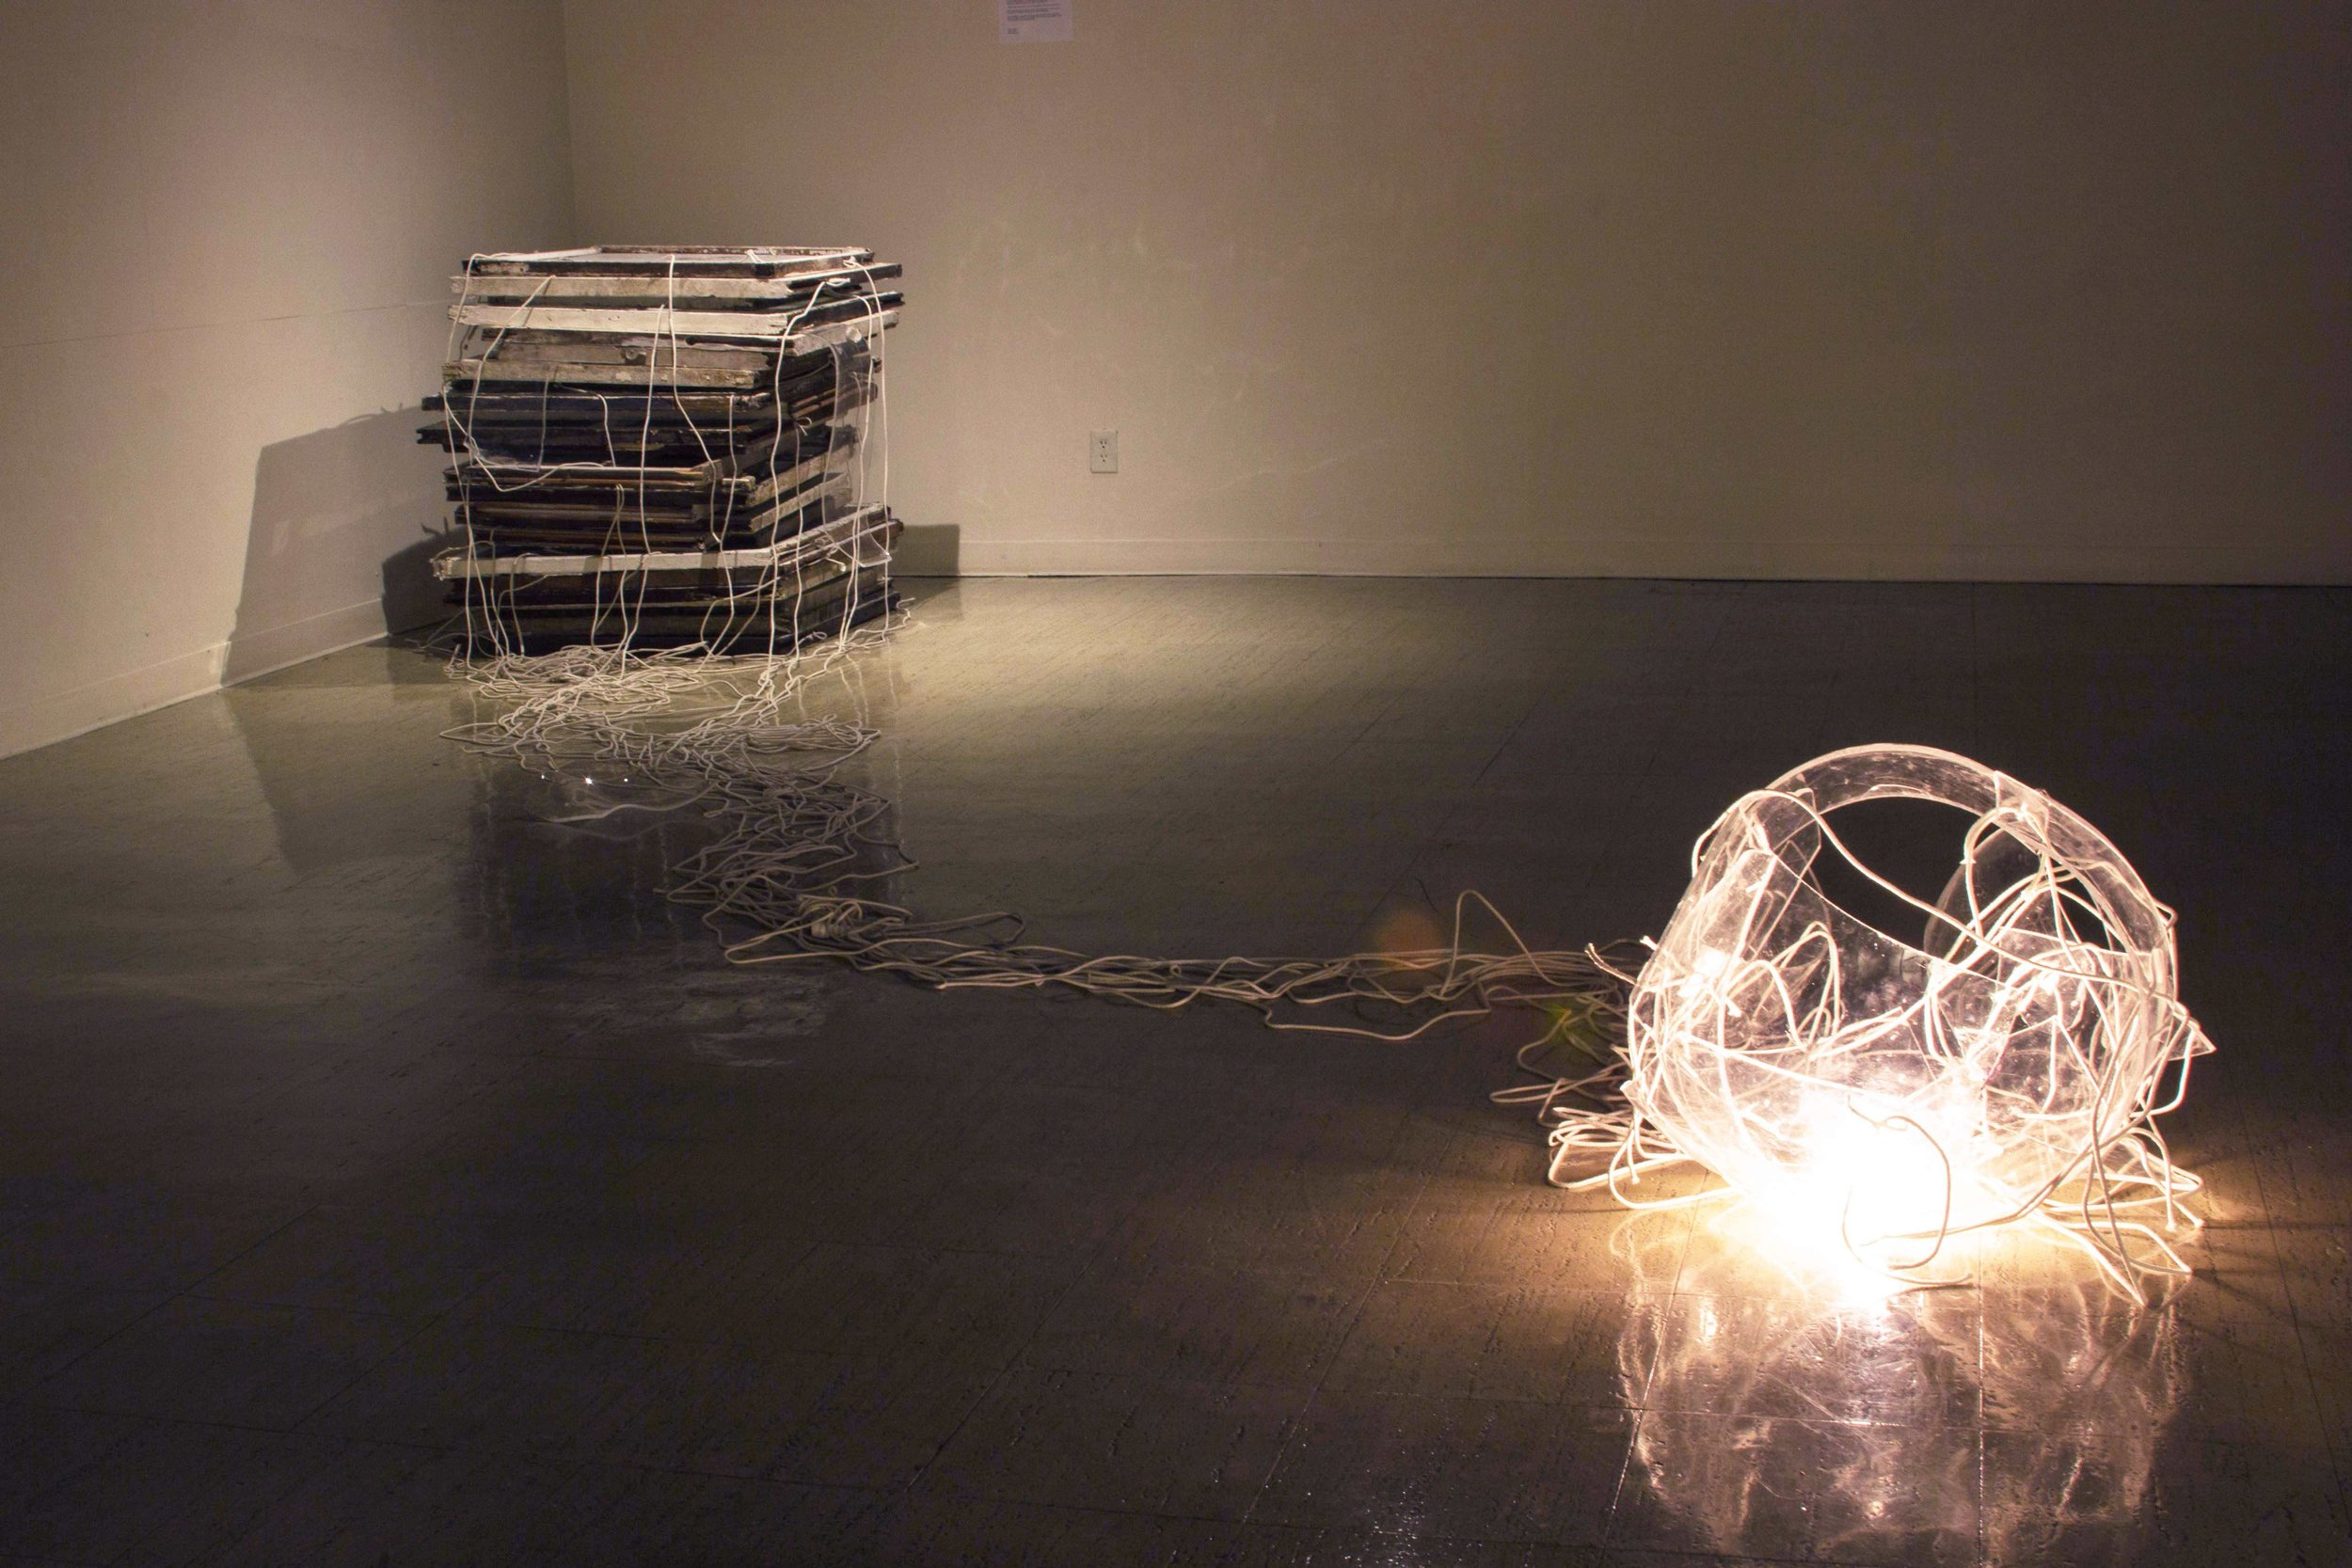 """House"" by Luke Gnadinger,Windows, Cord, Lights, Slumped Plexiglass,4Tx20Wx20Dft, 2014"